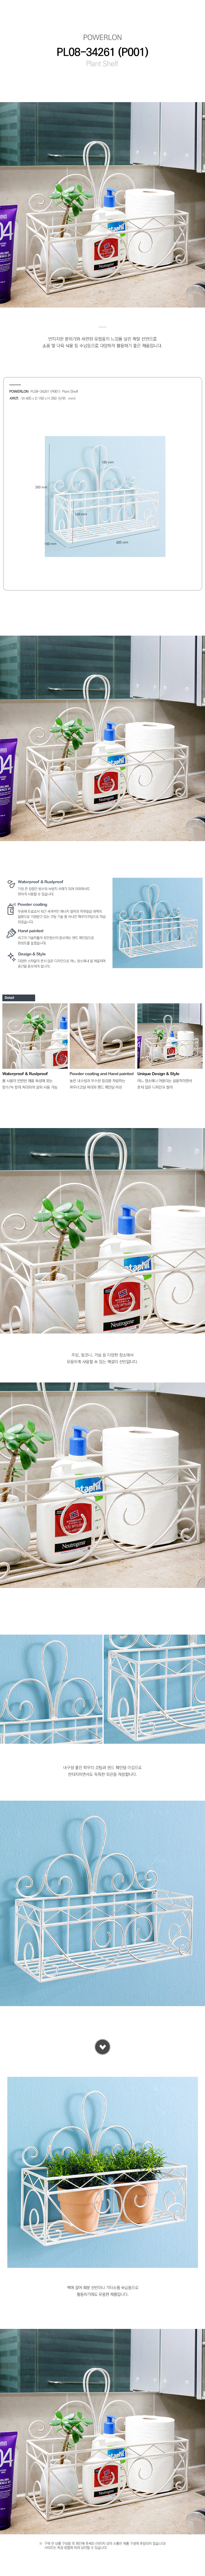 5_16_P001_Bathroom_Shelf_1.jpg